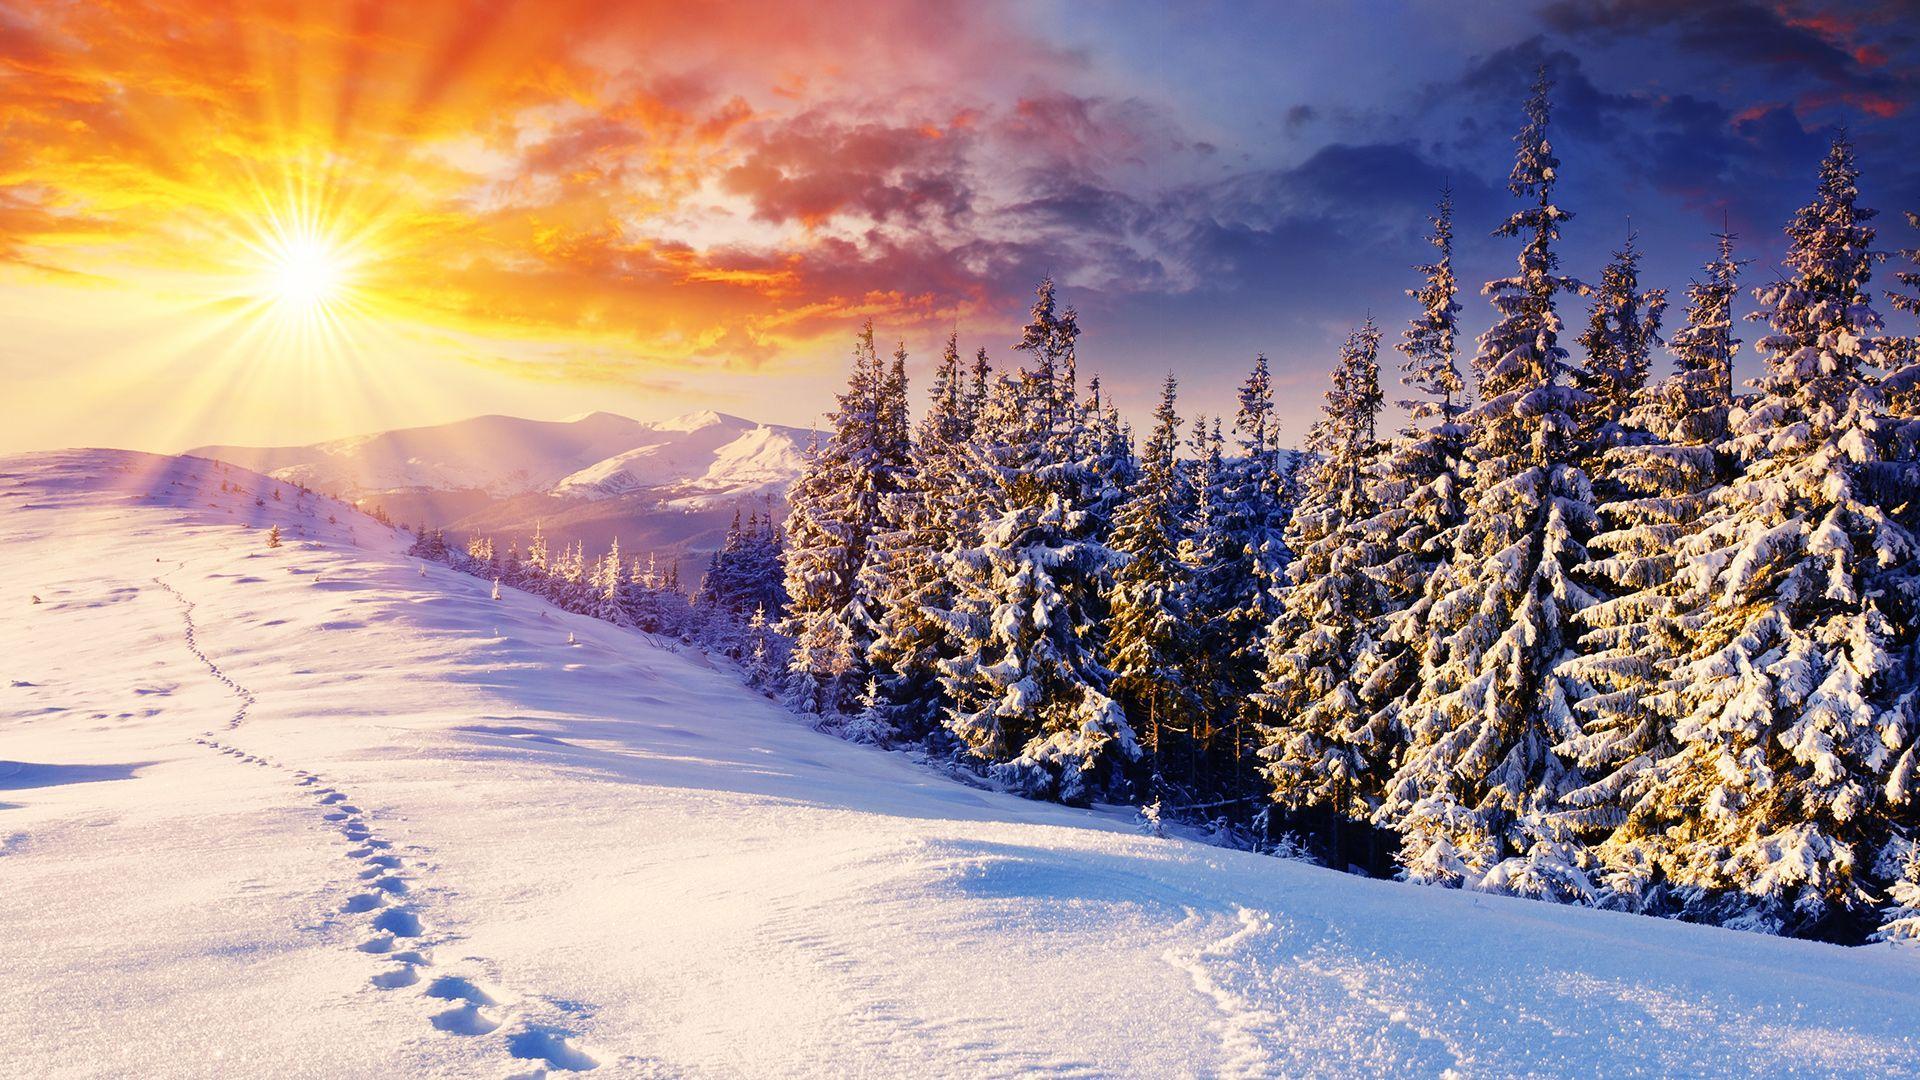 Winter Hd Desktop Wallpapers Top Free Winter Hd Desktop Backgrounds Wallpaperaccess